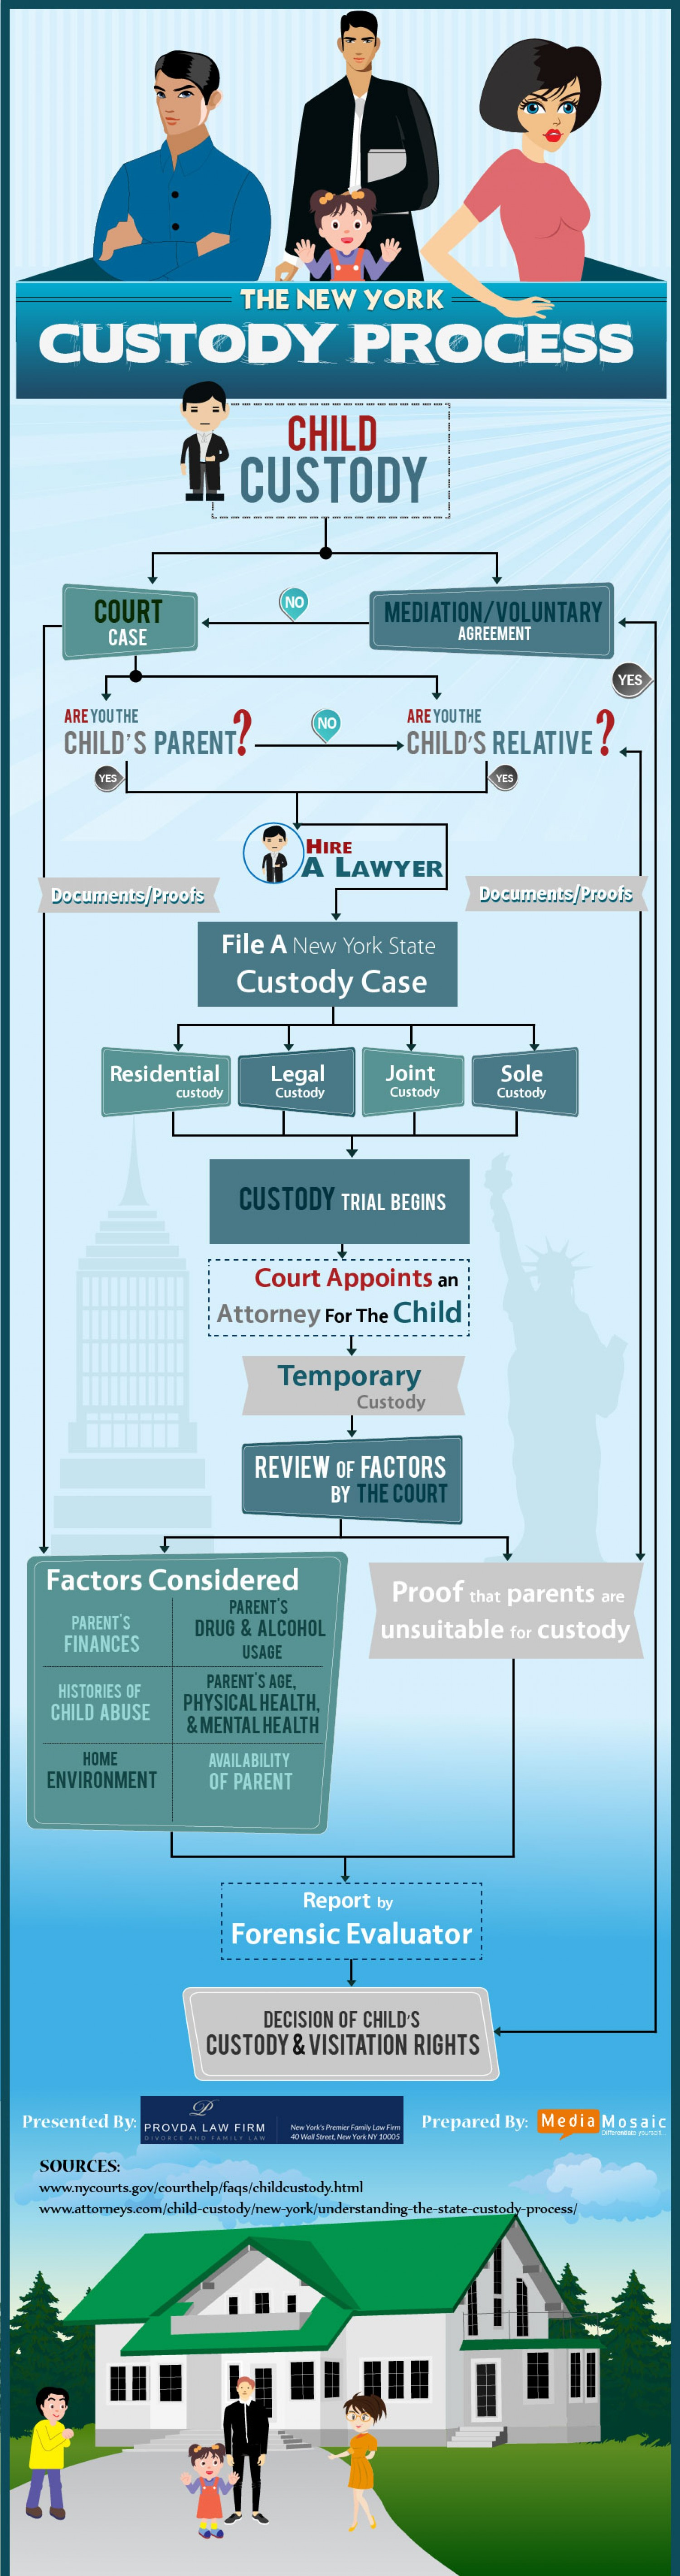 18. Requirements of Child Custody